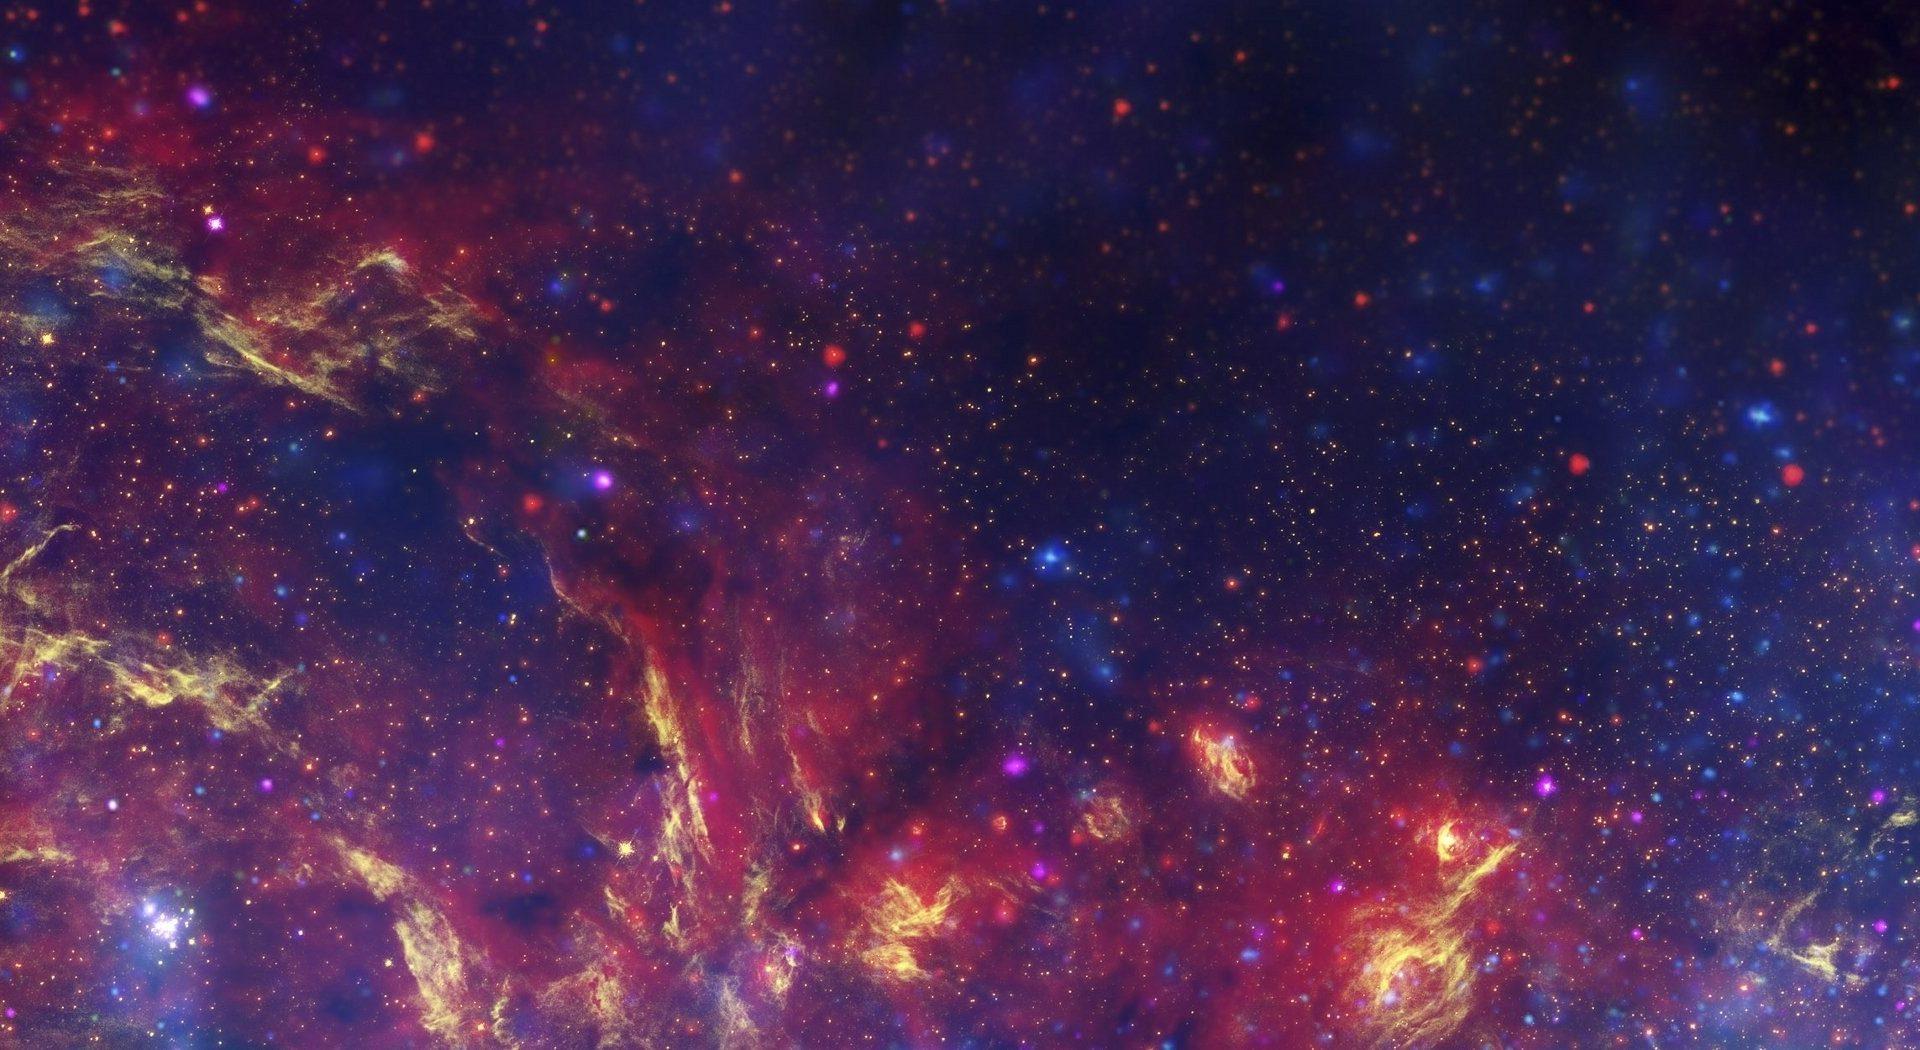 Space Wallpaper 21 9 1920x1050 Wallpaper Teahub Io